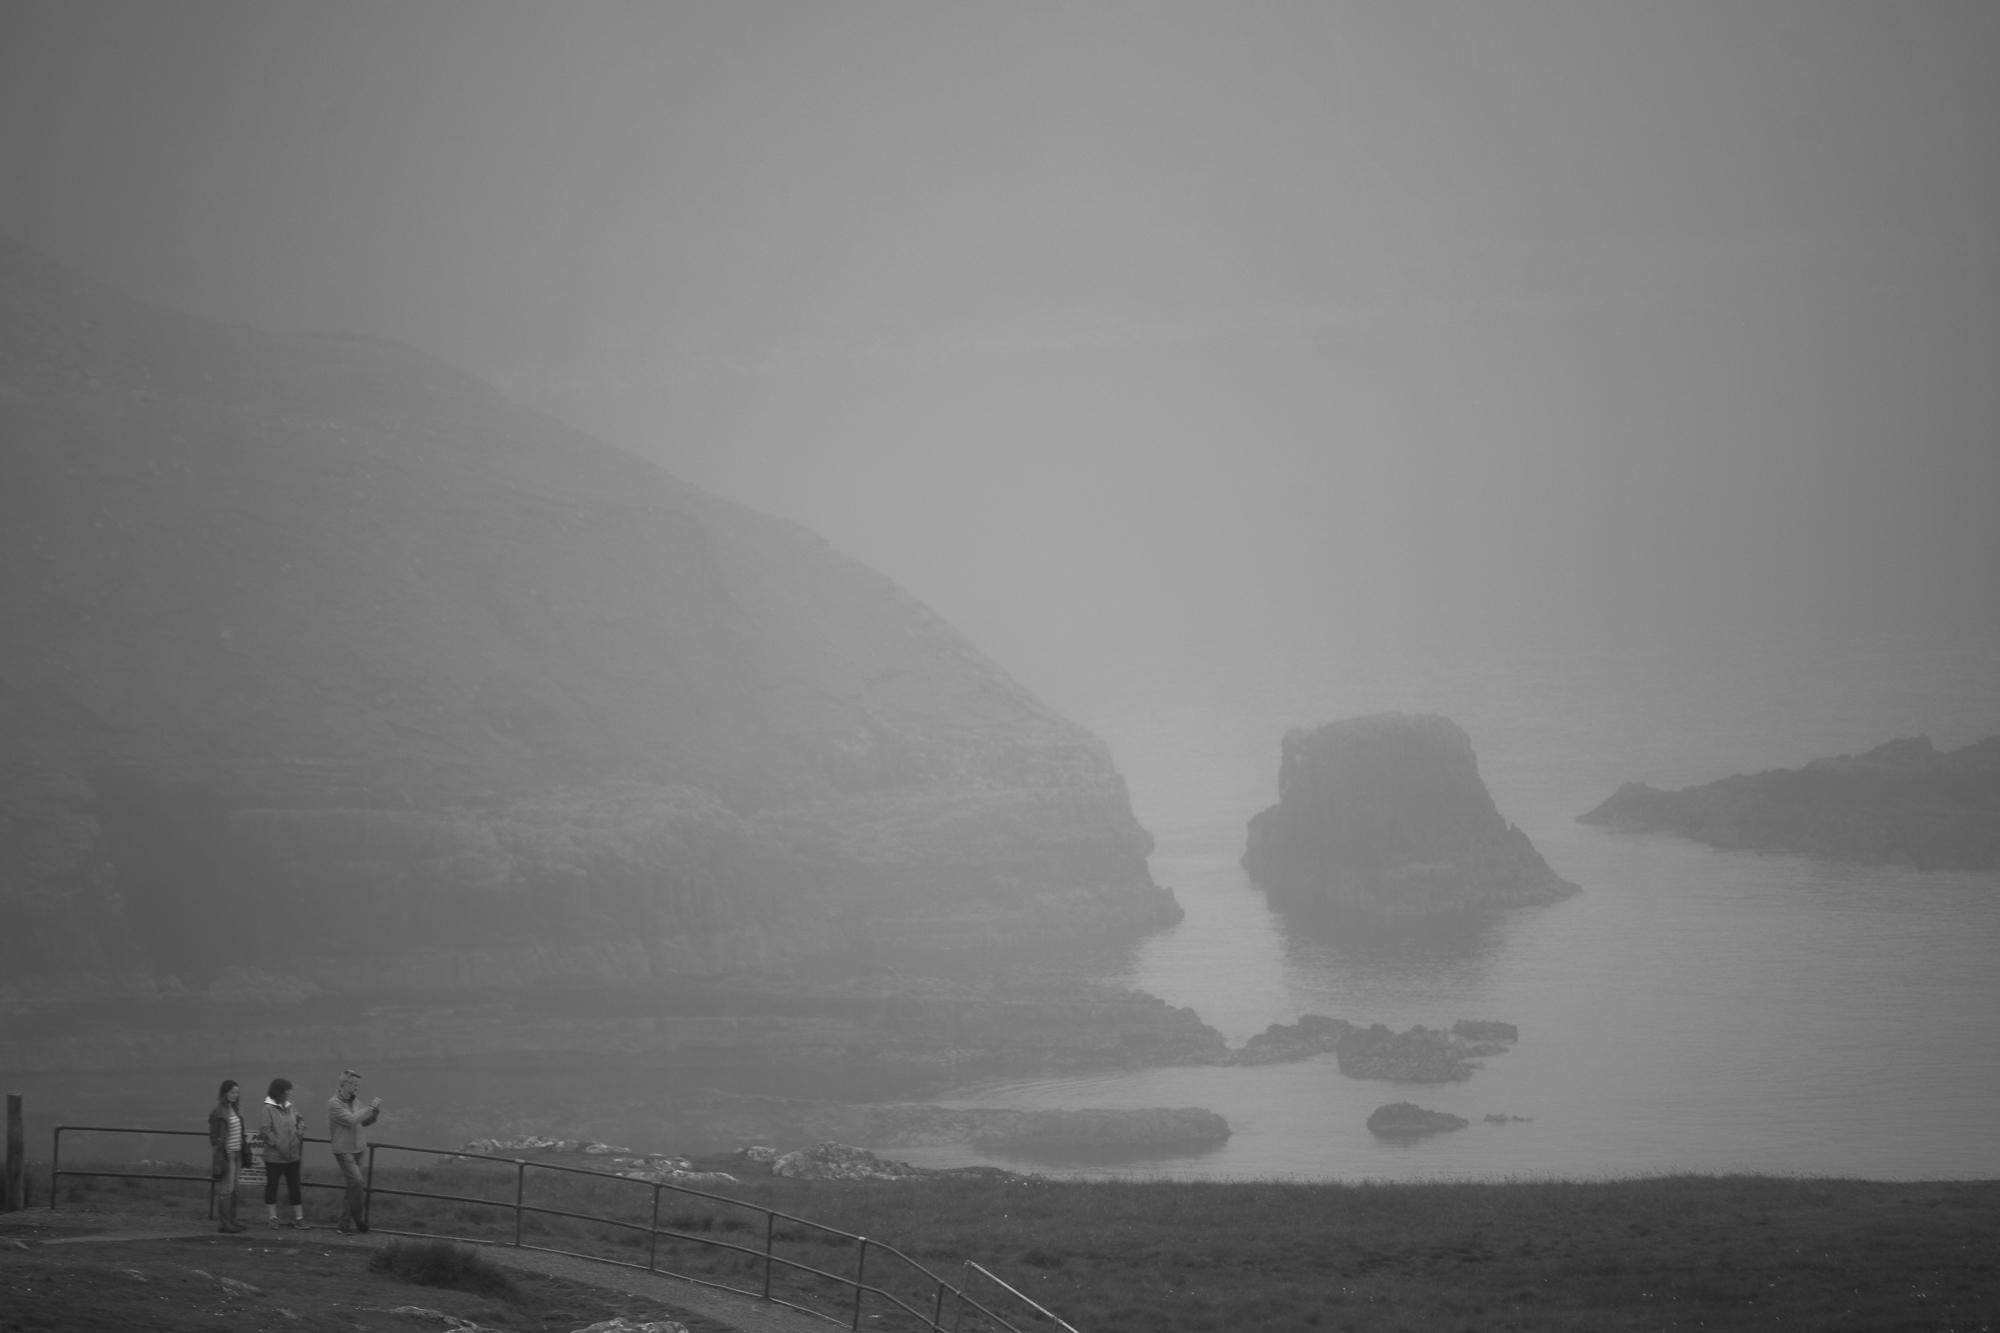 Neist Point, Isle of Skye - Scotland, 2014